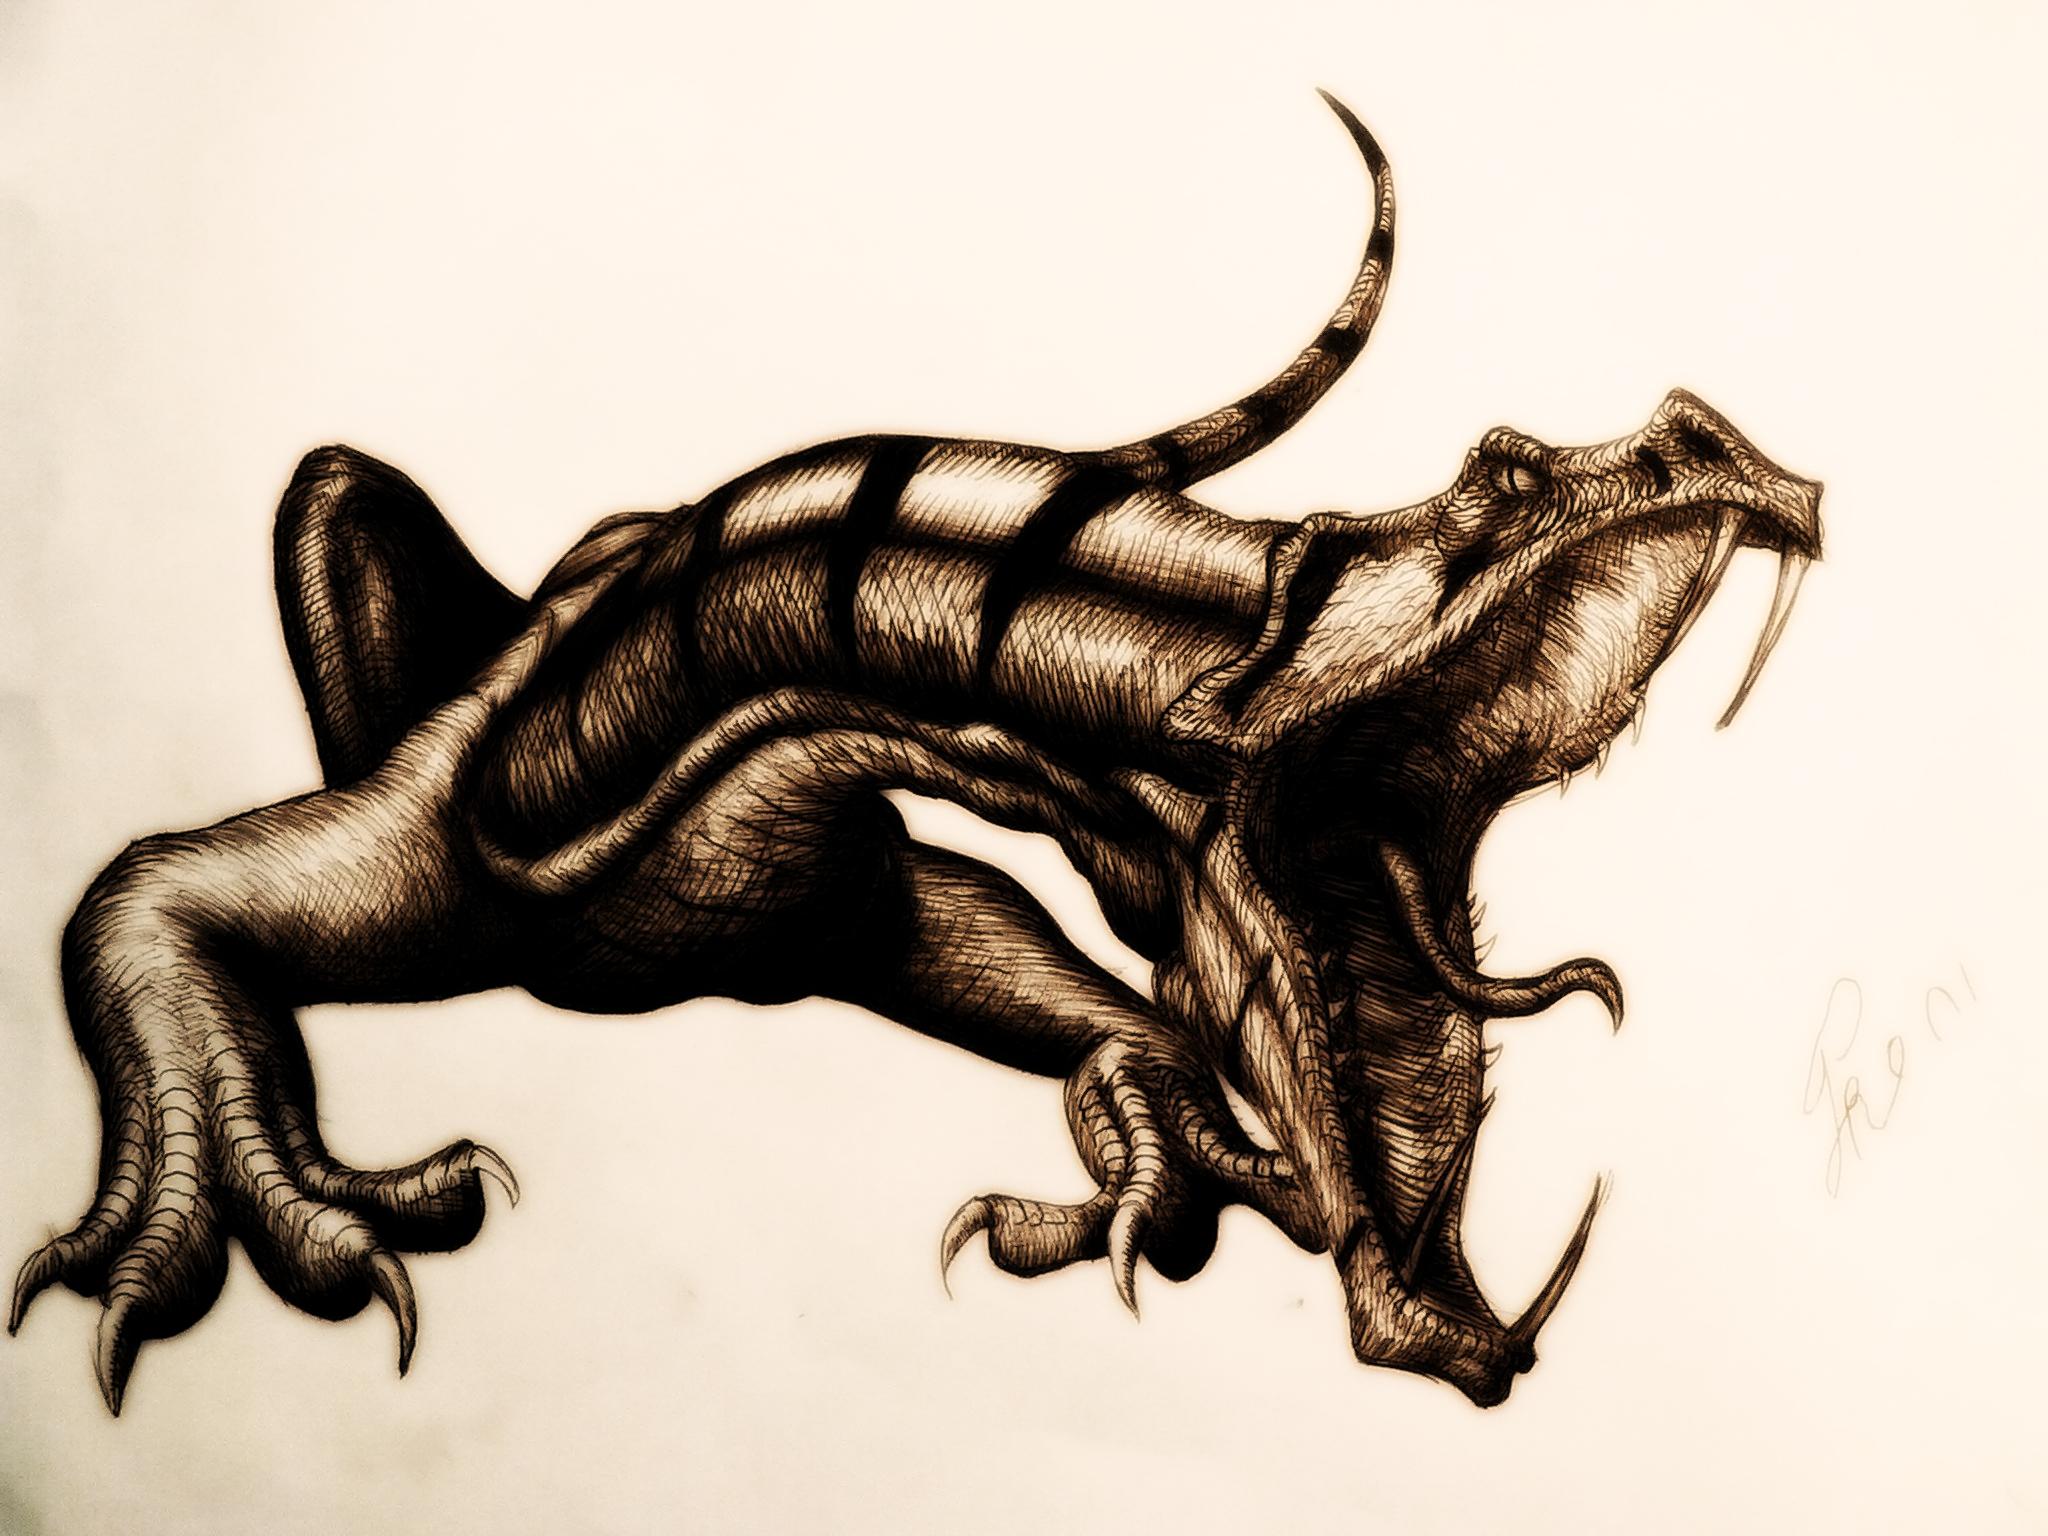 Dragon by GodAntichrist